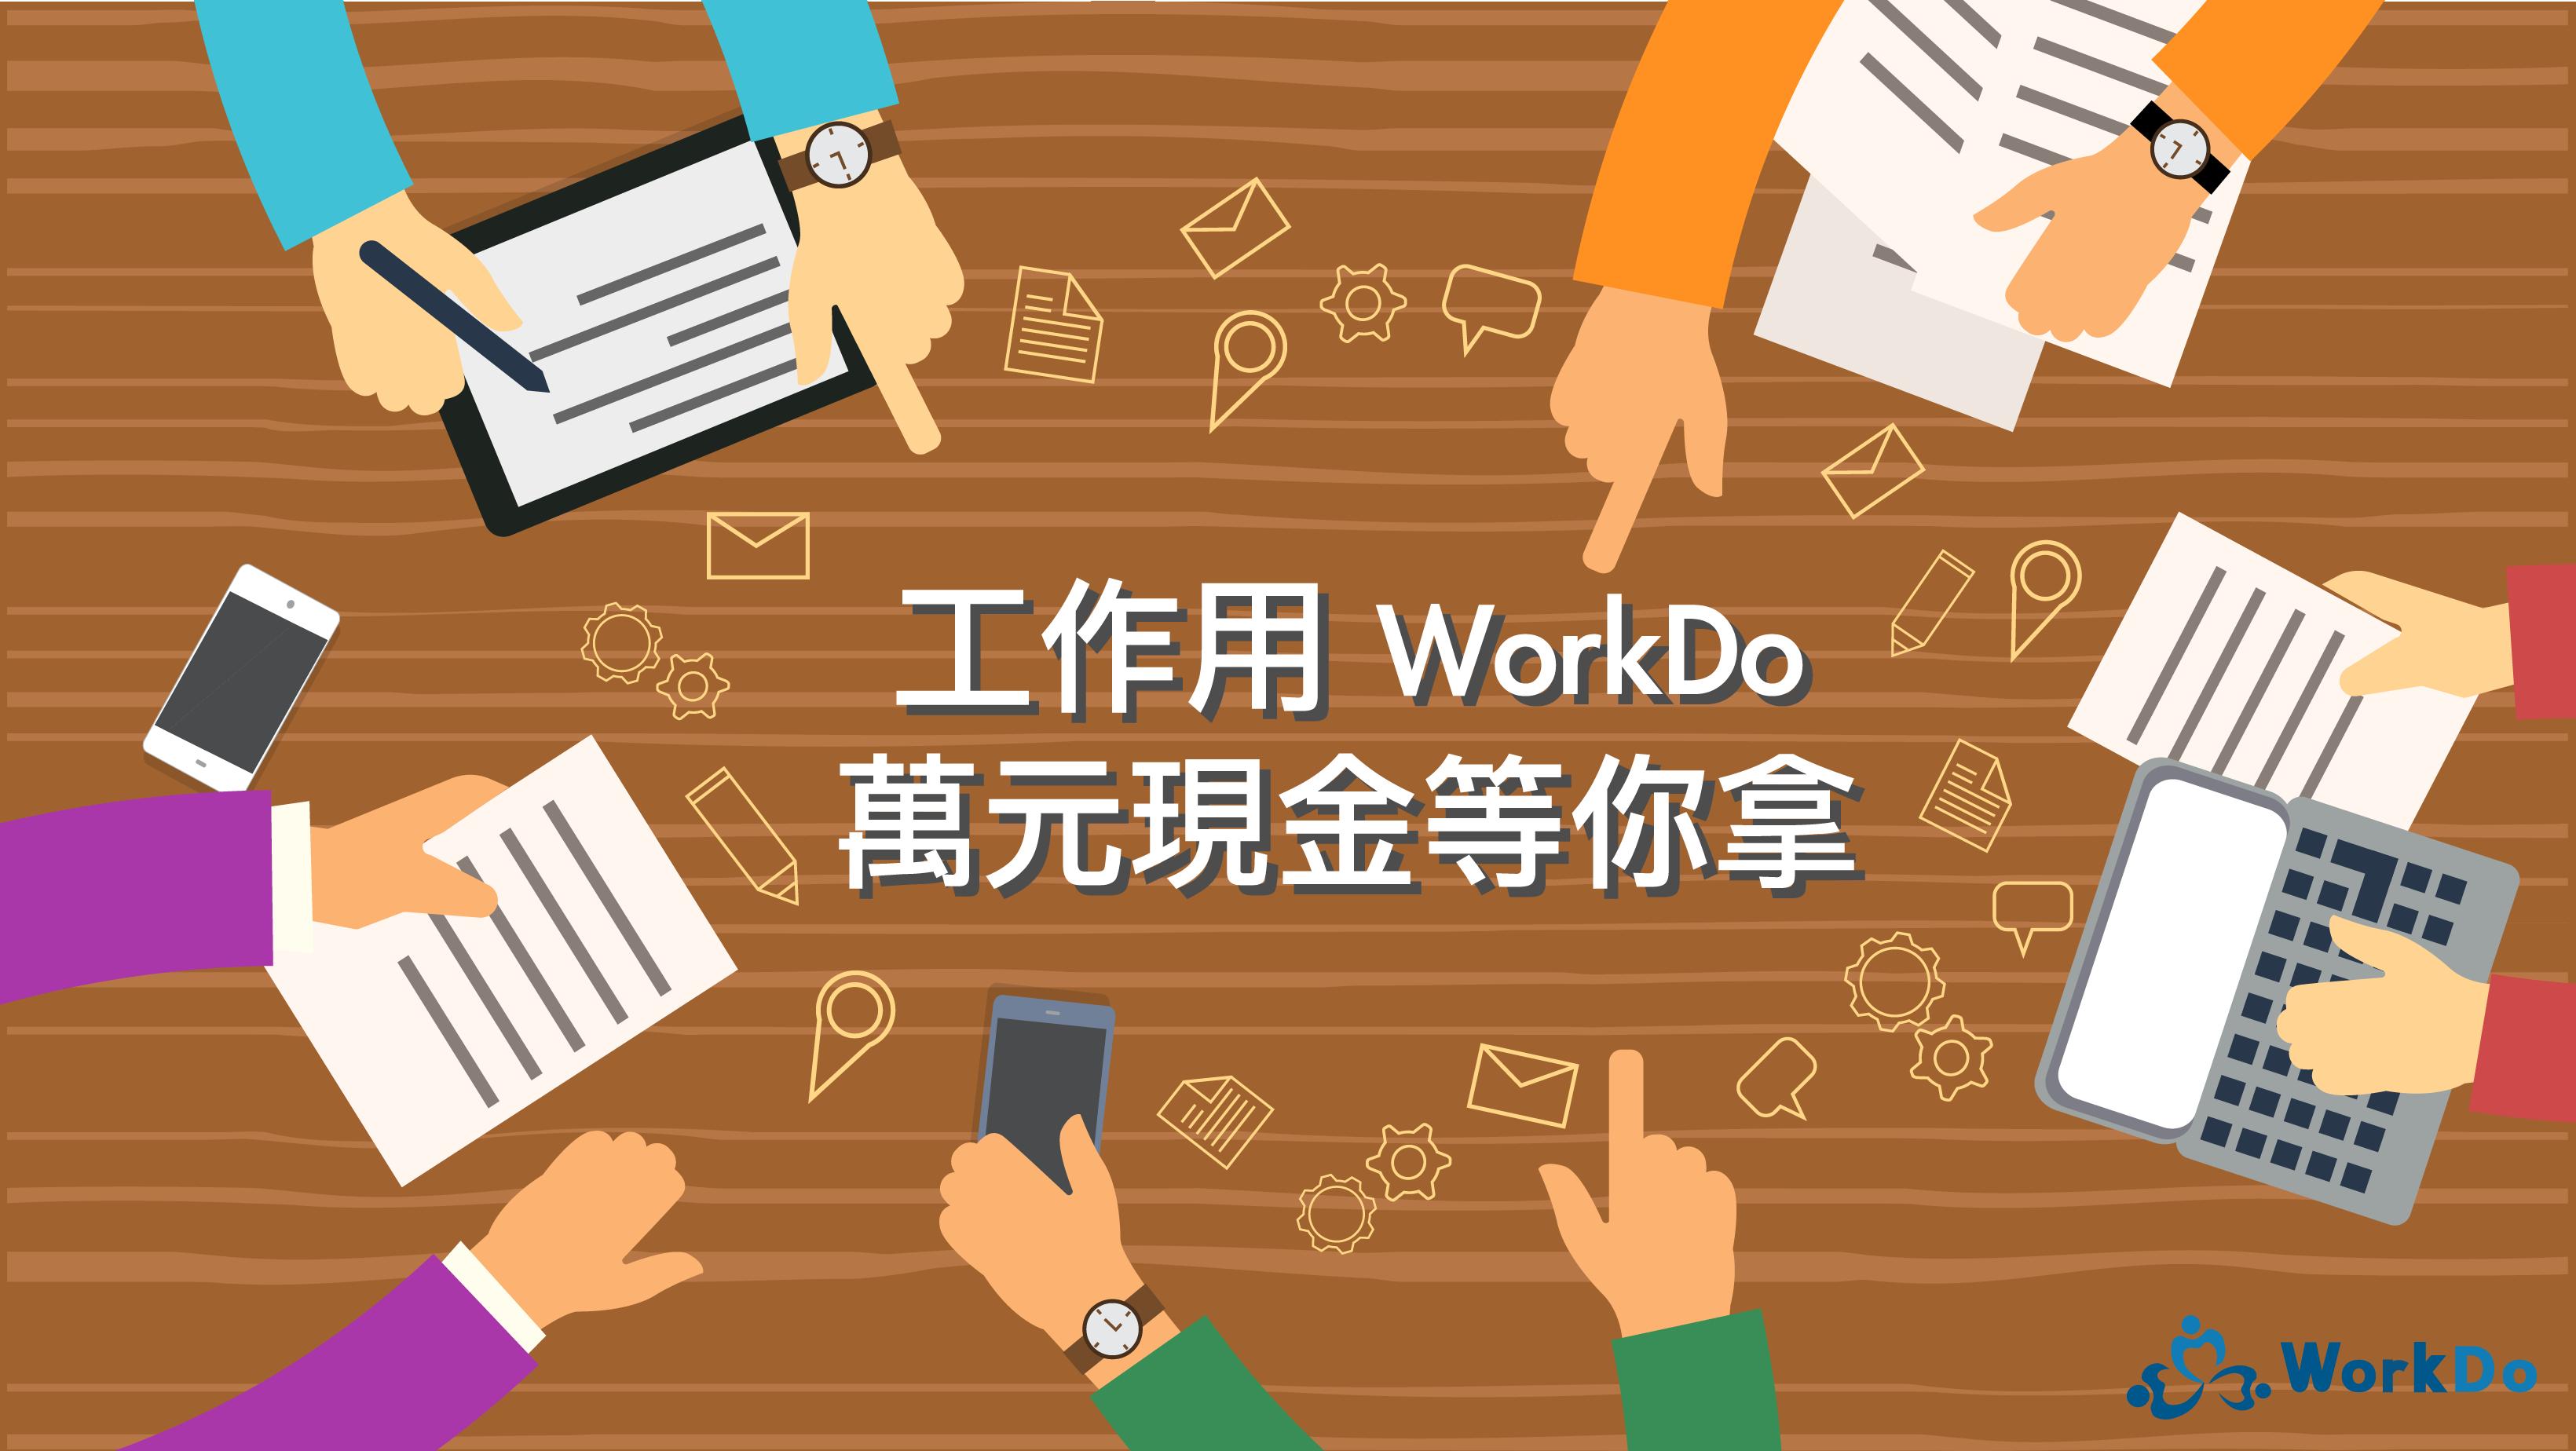 WorkDo抽獎活動